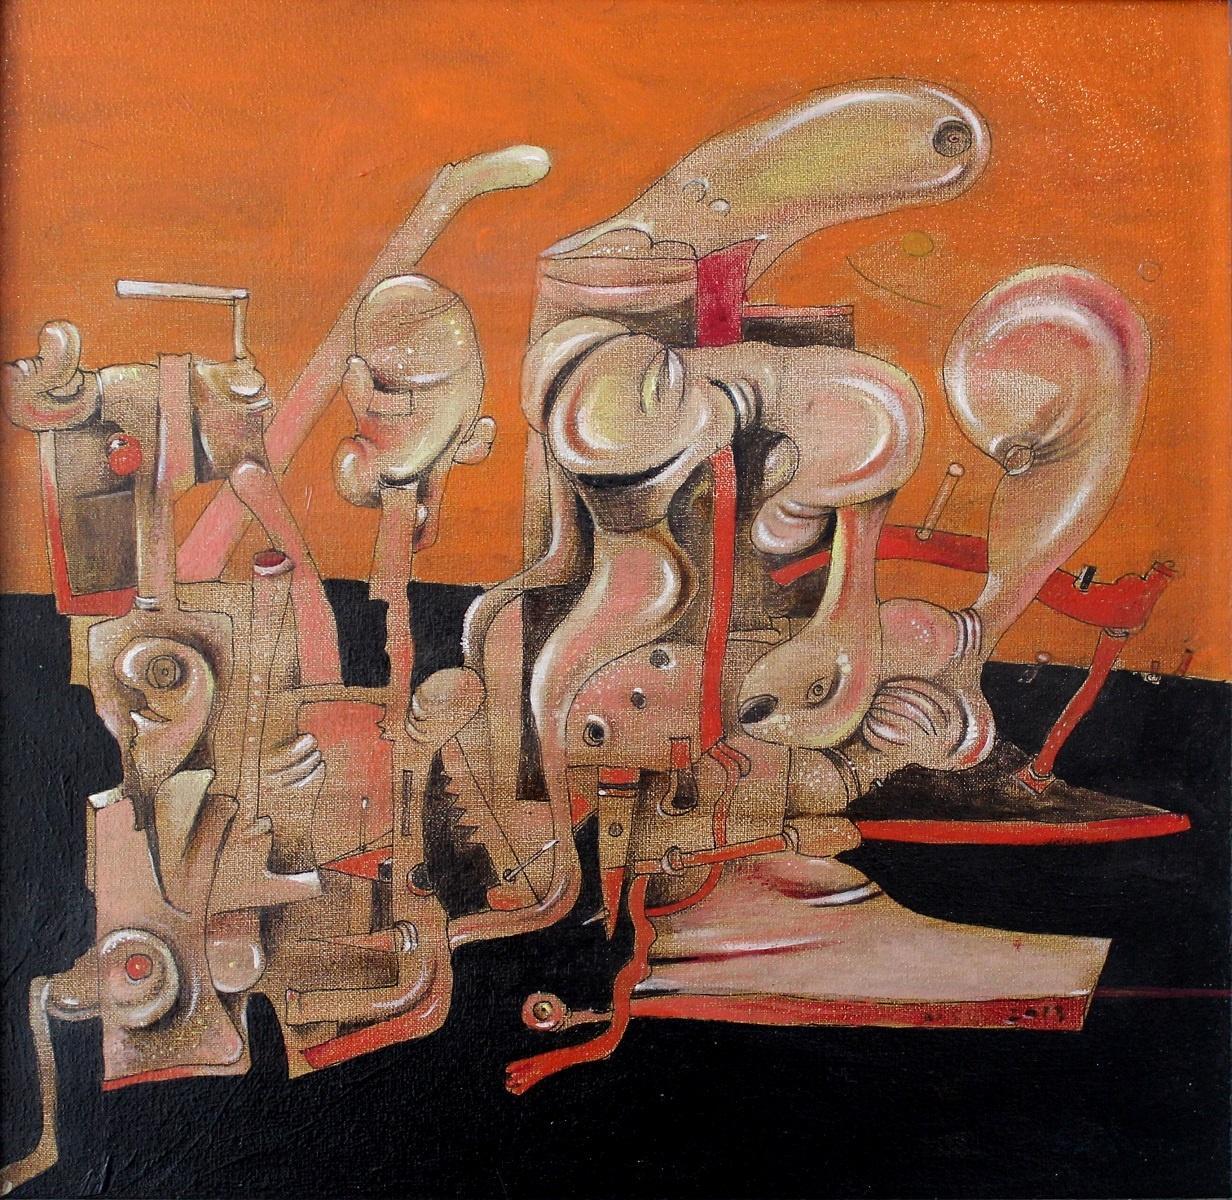 Orange composition -  Contemporary Surreal Paintings, Vibrant orange & black